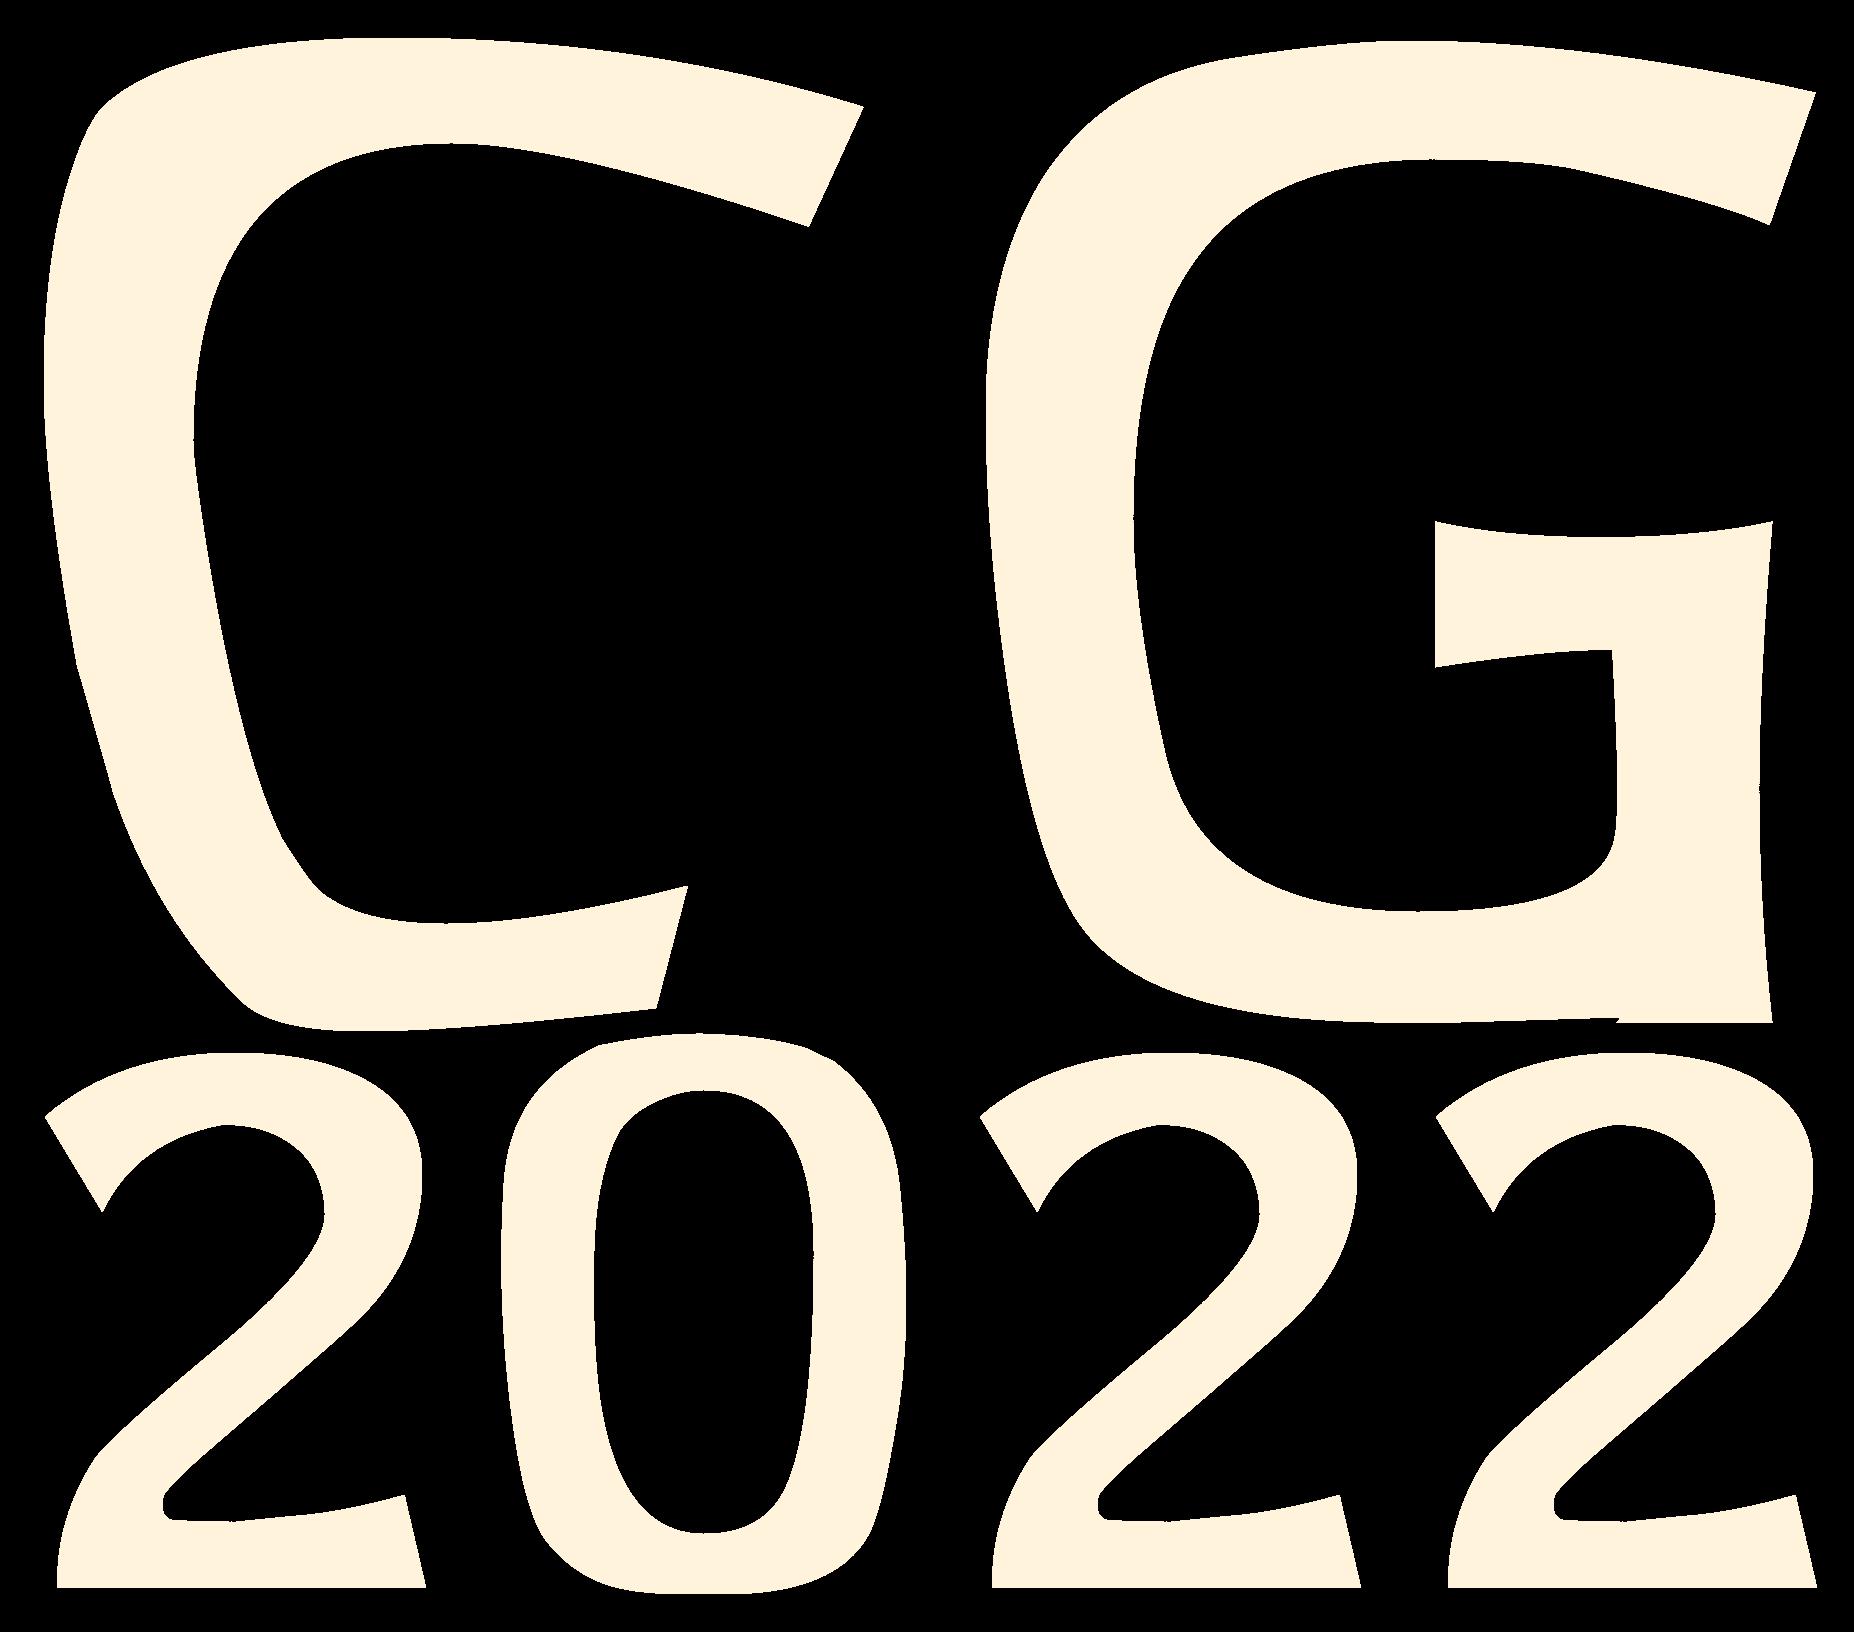 CG-2022